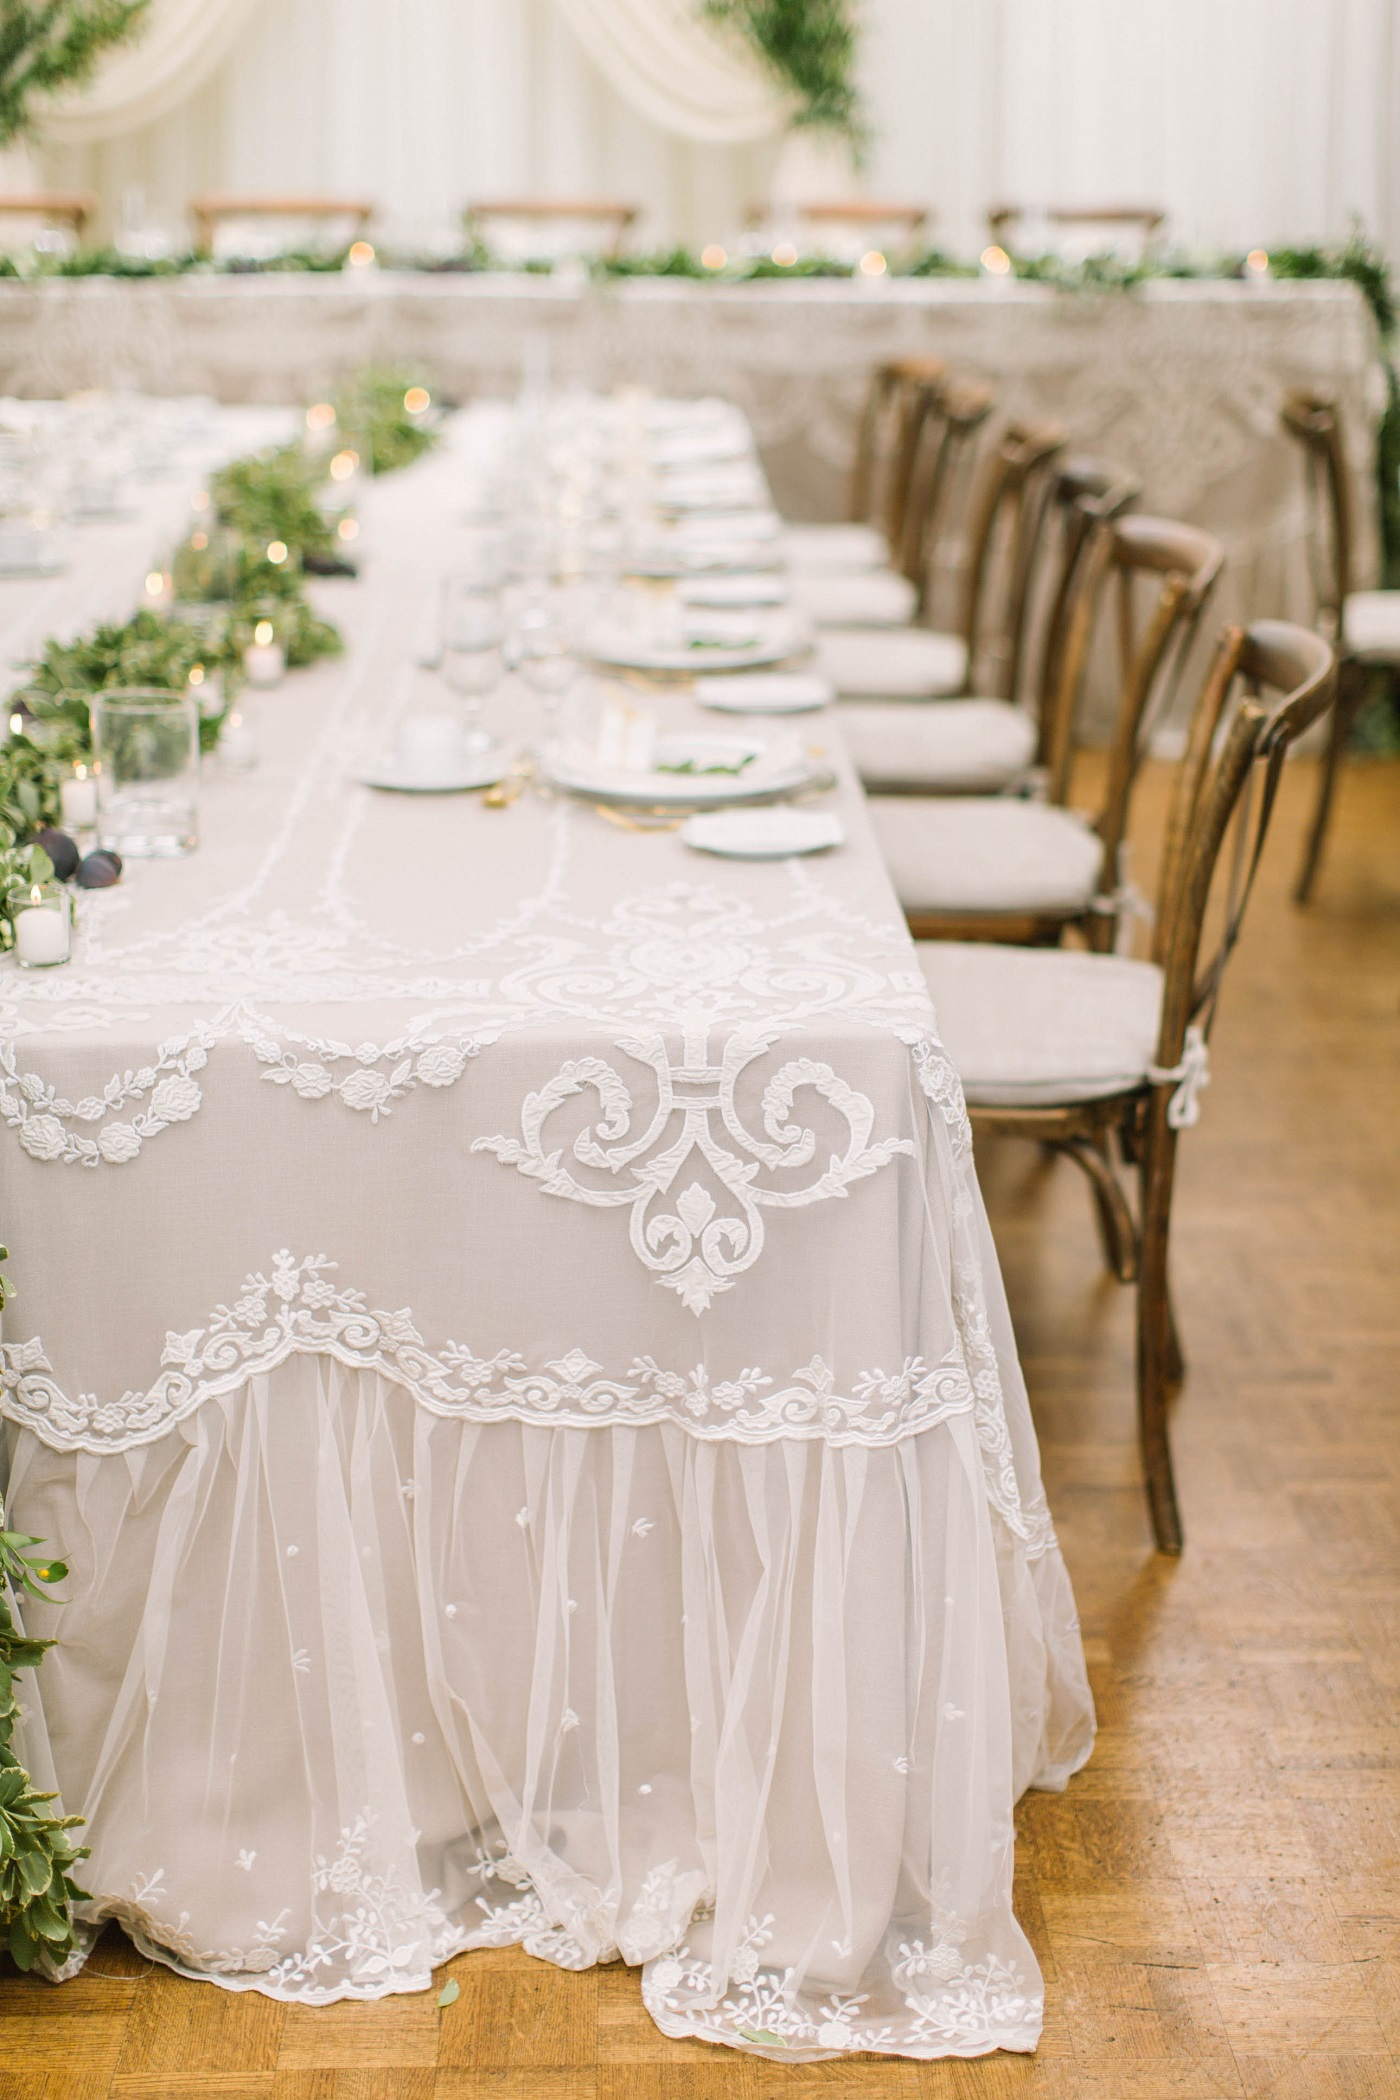 liuna-gardens-wedding-hamilton-kj-and-co-20.JPG